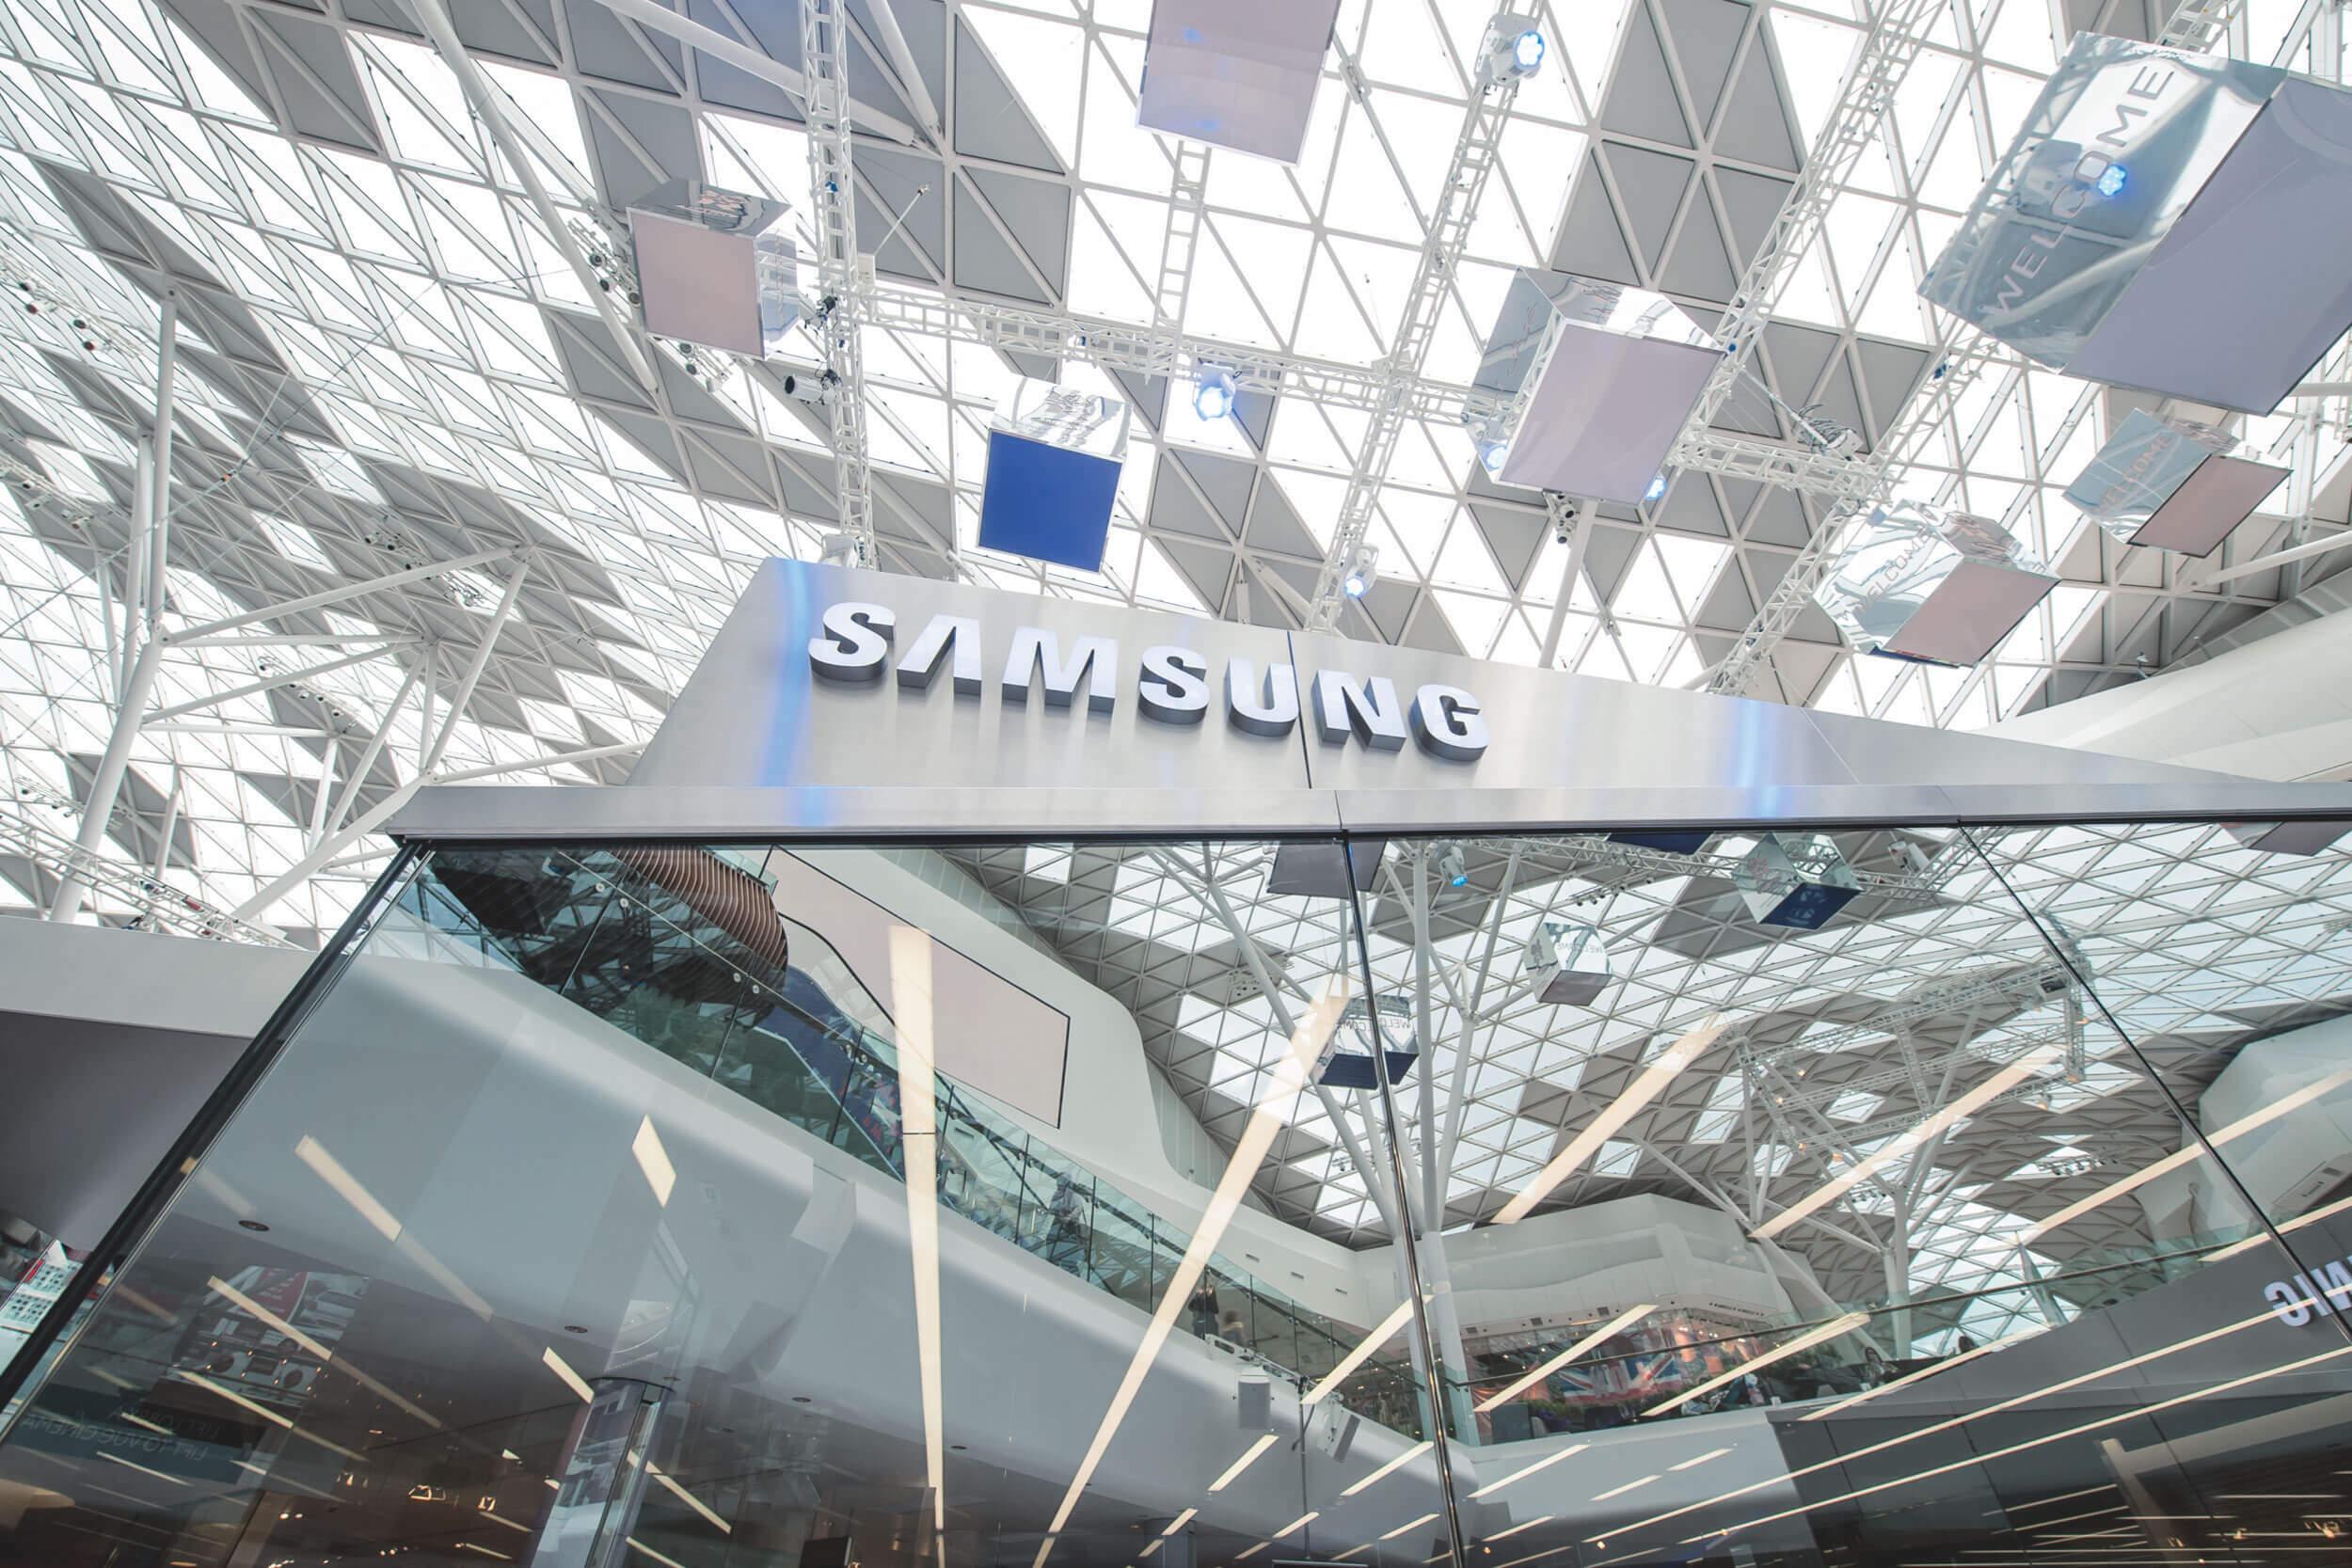 Nahaufnahme des Samsung Logos